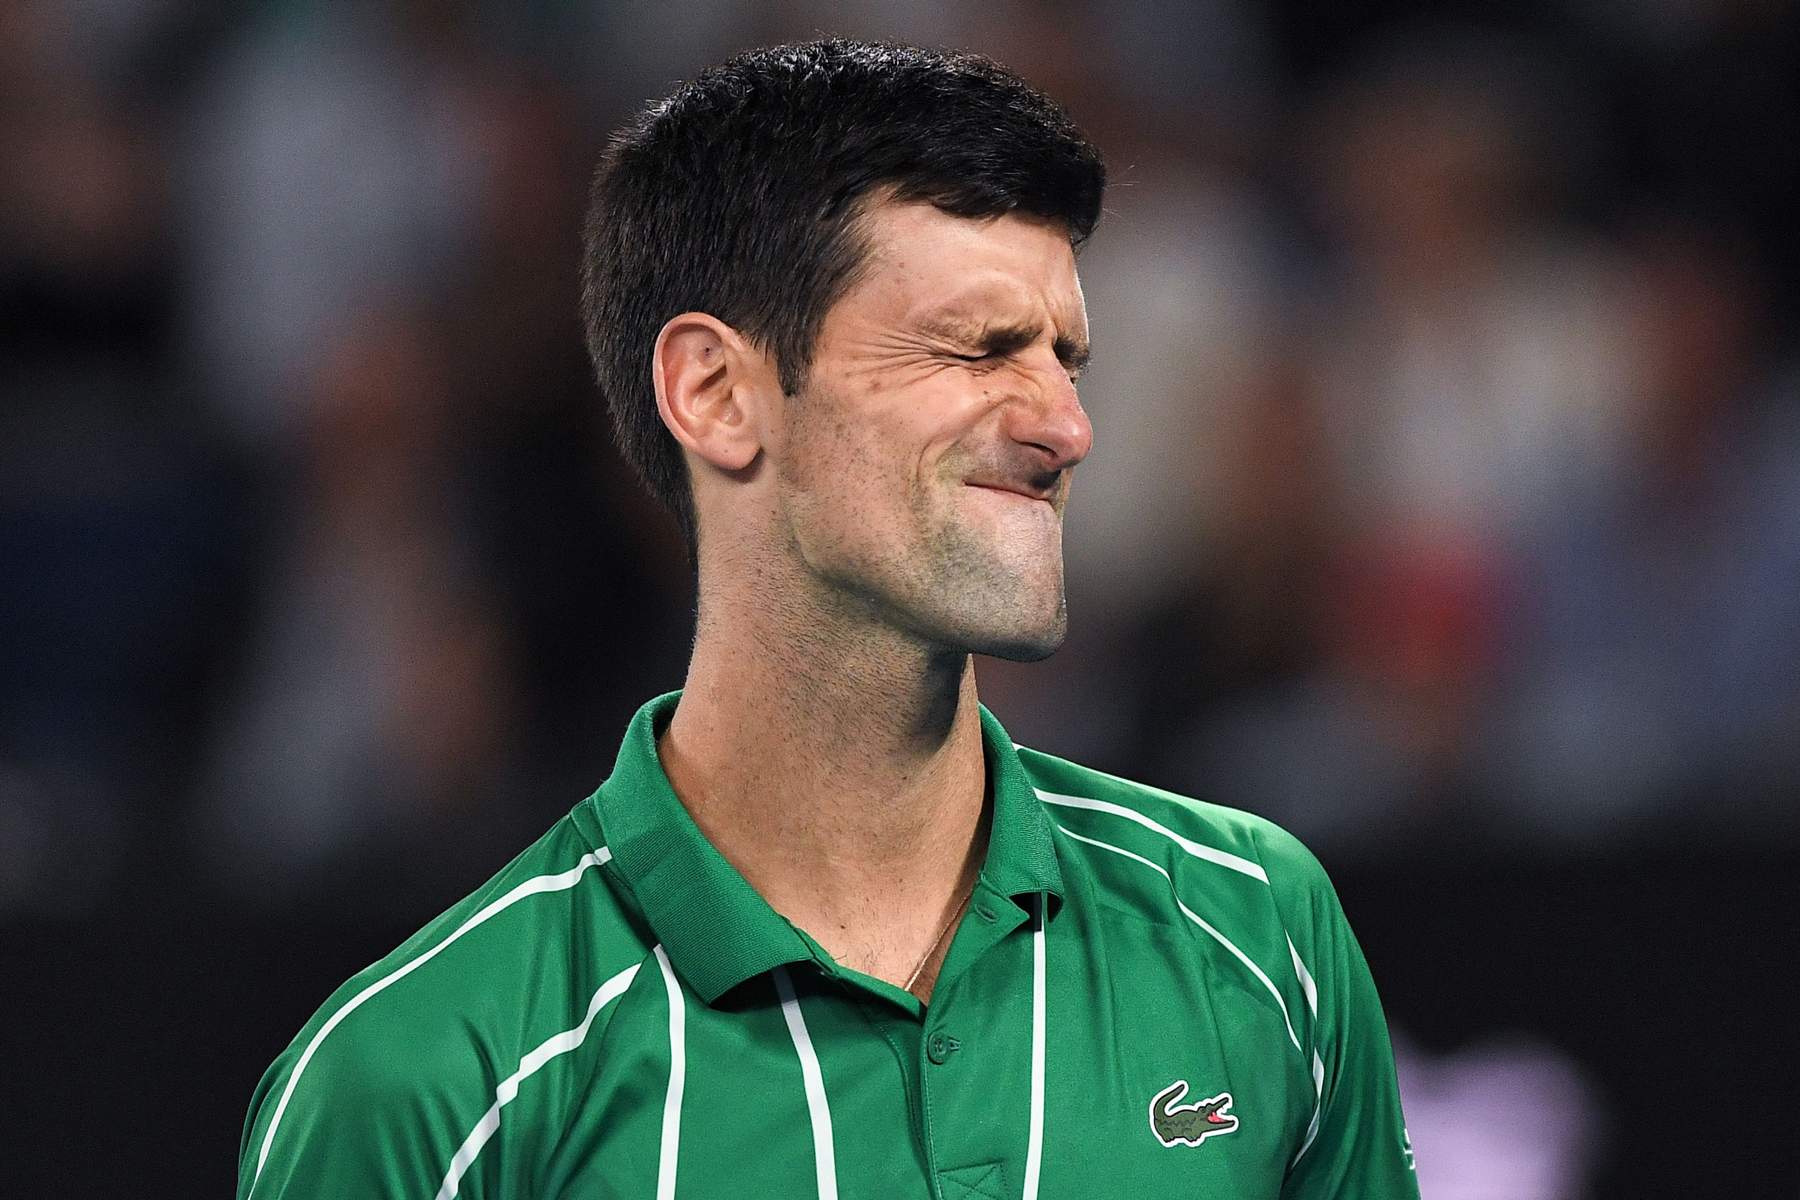 Tennis Star Novak Djokovic Reveals He S An Anti Vaxxer Rolling Stone